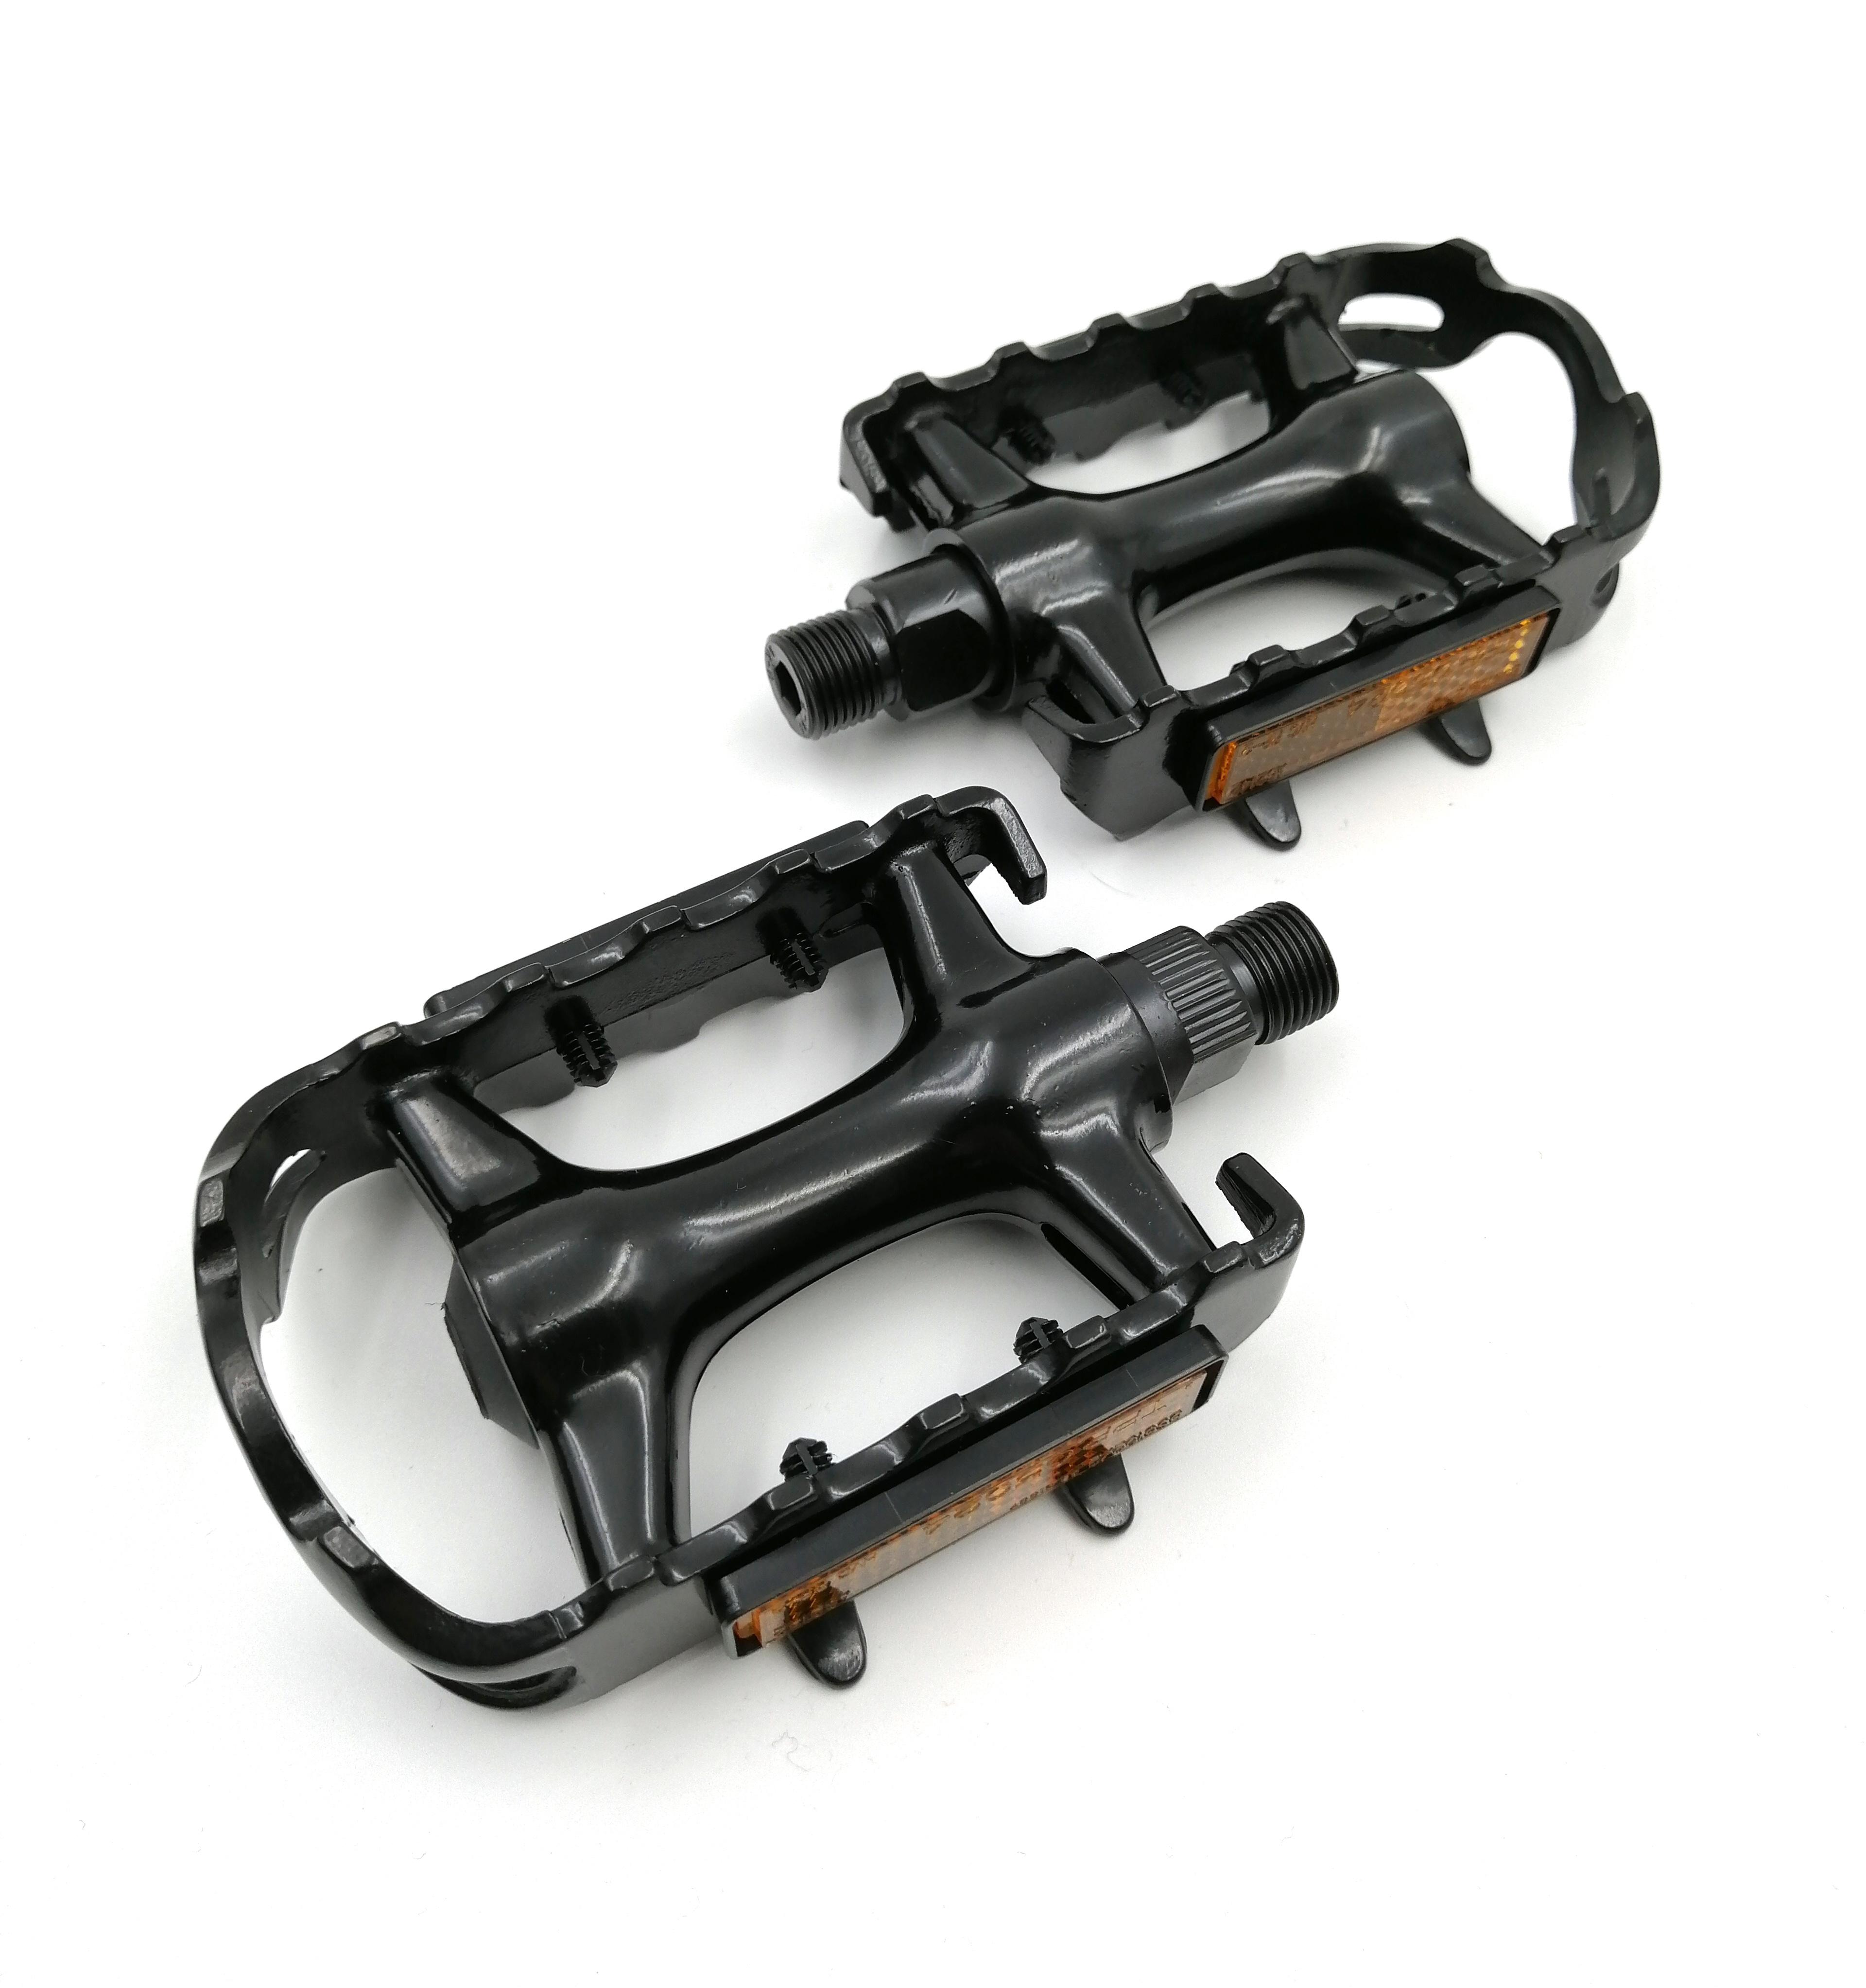 PEDALE FPD NWL-108 Black body/Boron axle 106x63x26